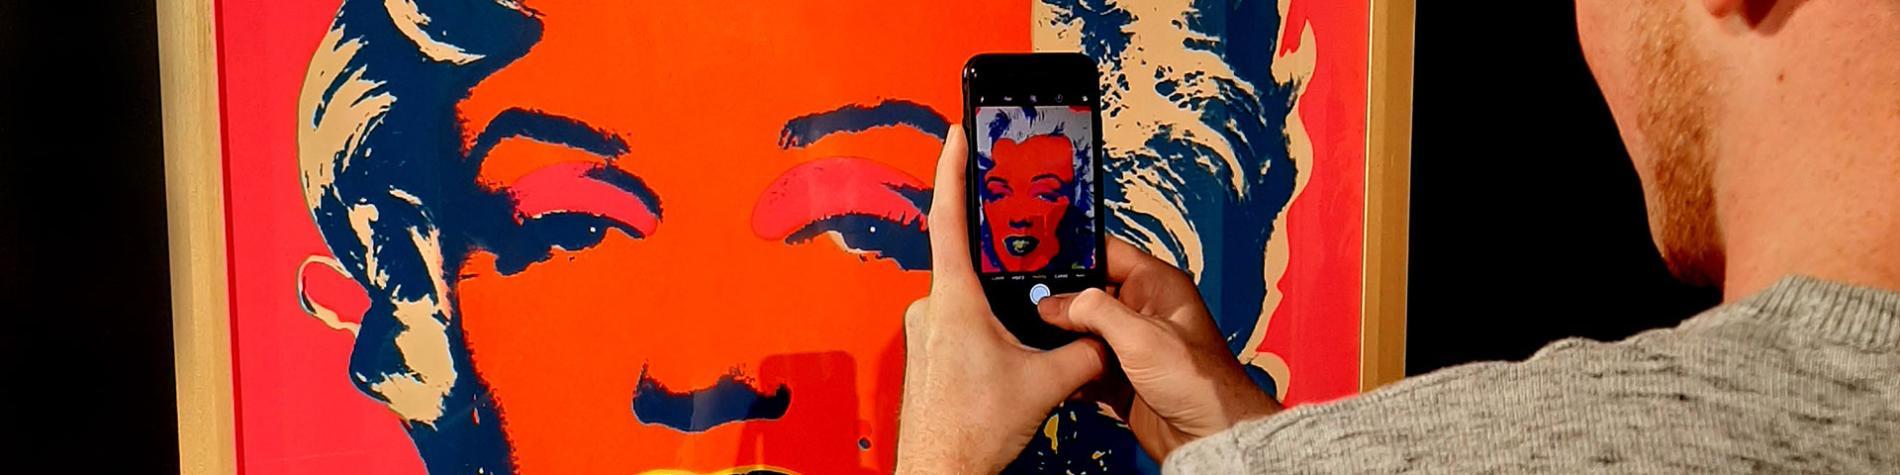 ArtHouse - art du XXe siècle - Source O Rama - Chaudfontaine - Marilyn Monroe